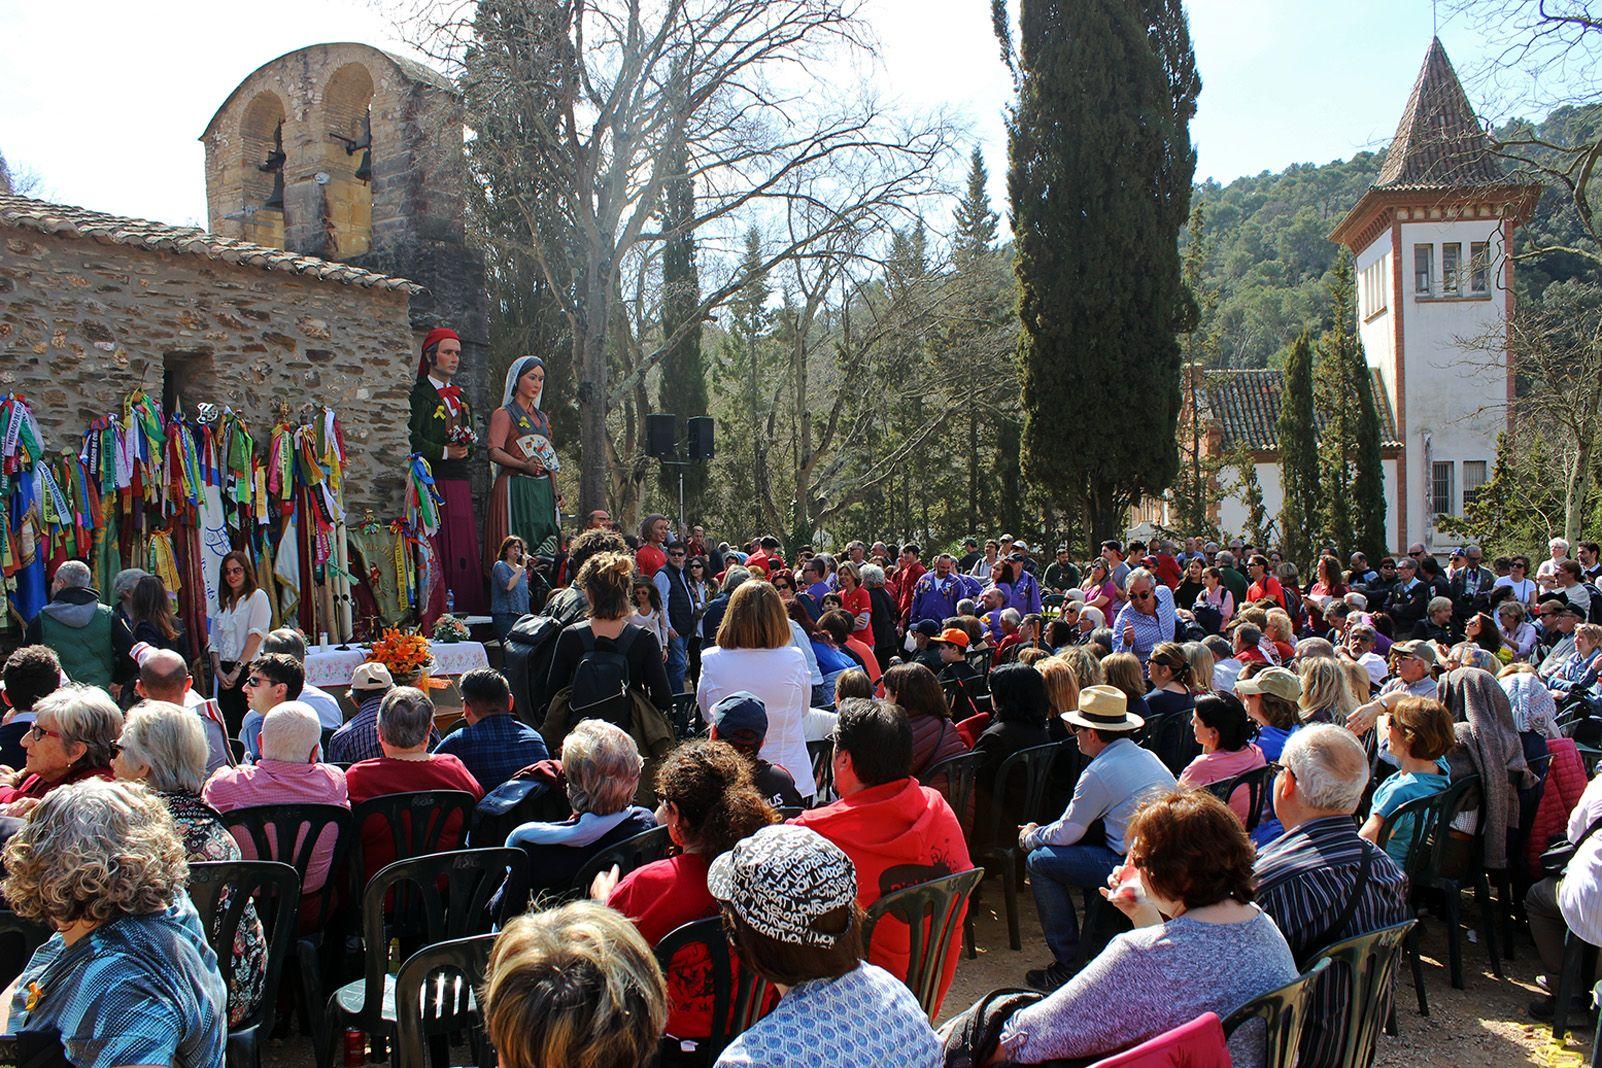 Aplec de Sant Medir. Foto: Ale Gomez